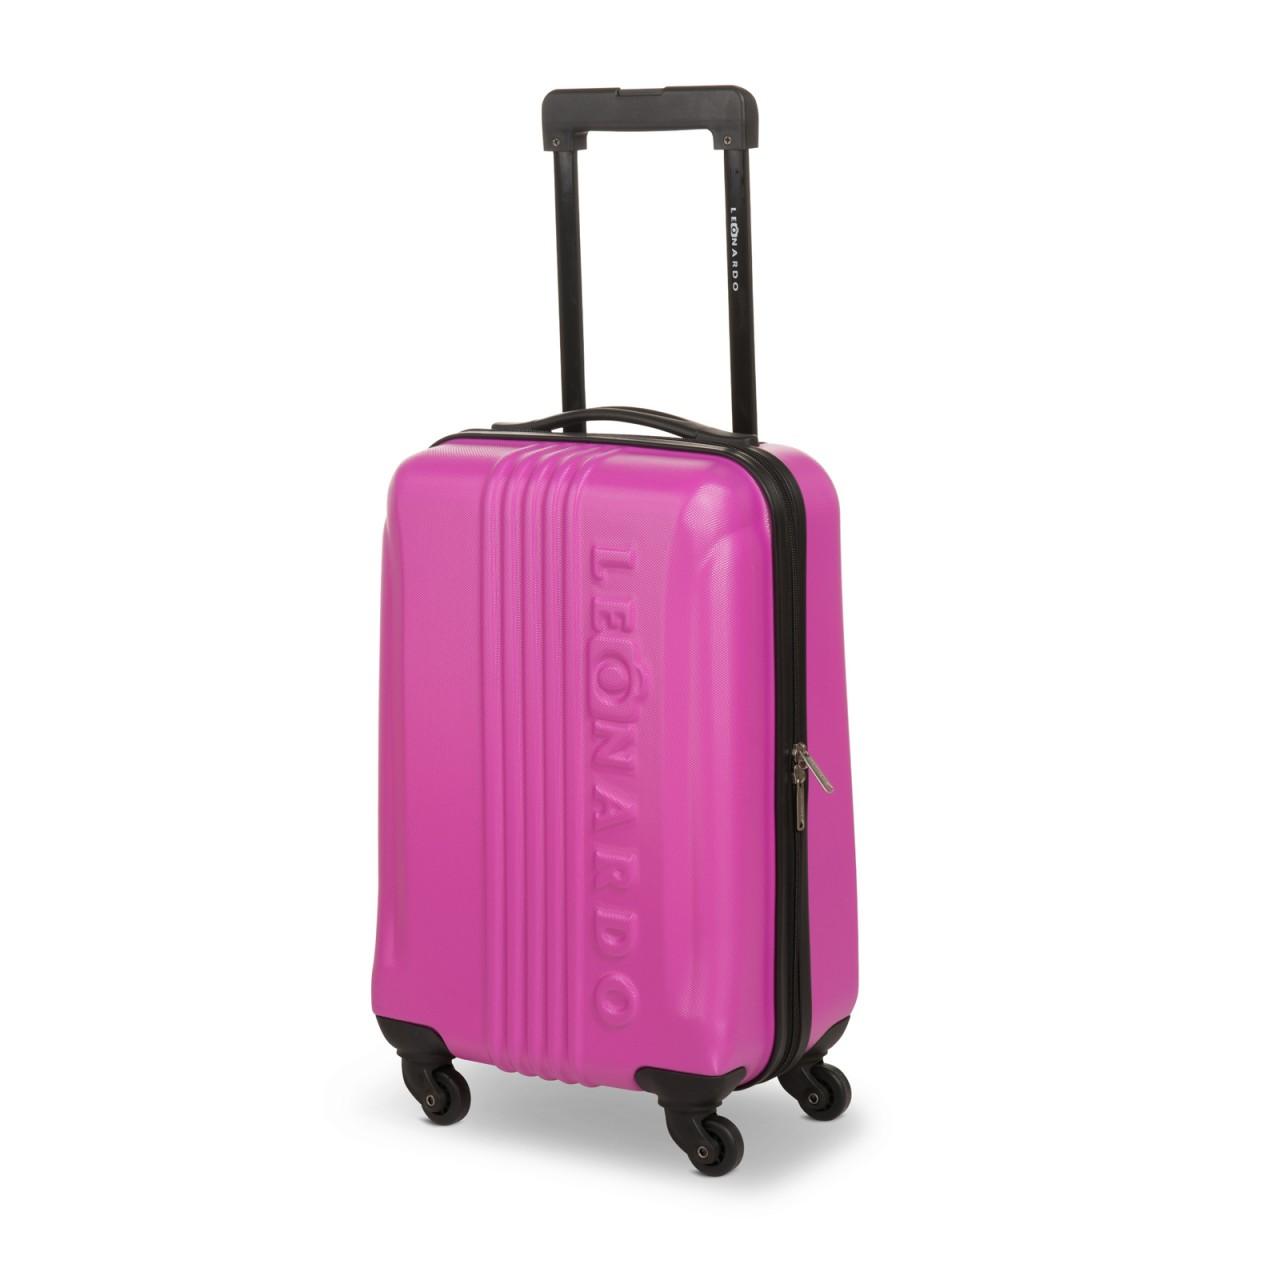 preisvergleich leonardo koffer pink reisegep ck trolley. Black Bedroom Furniture Sets. Home Design Ideas